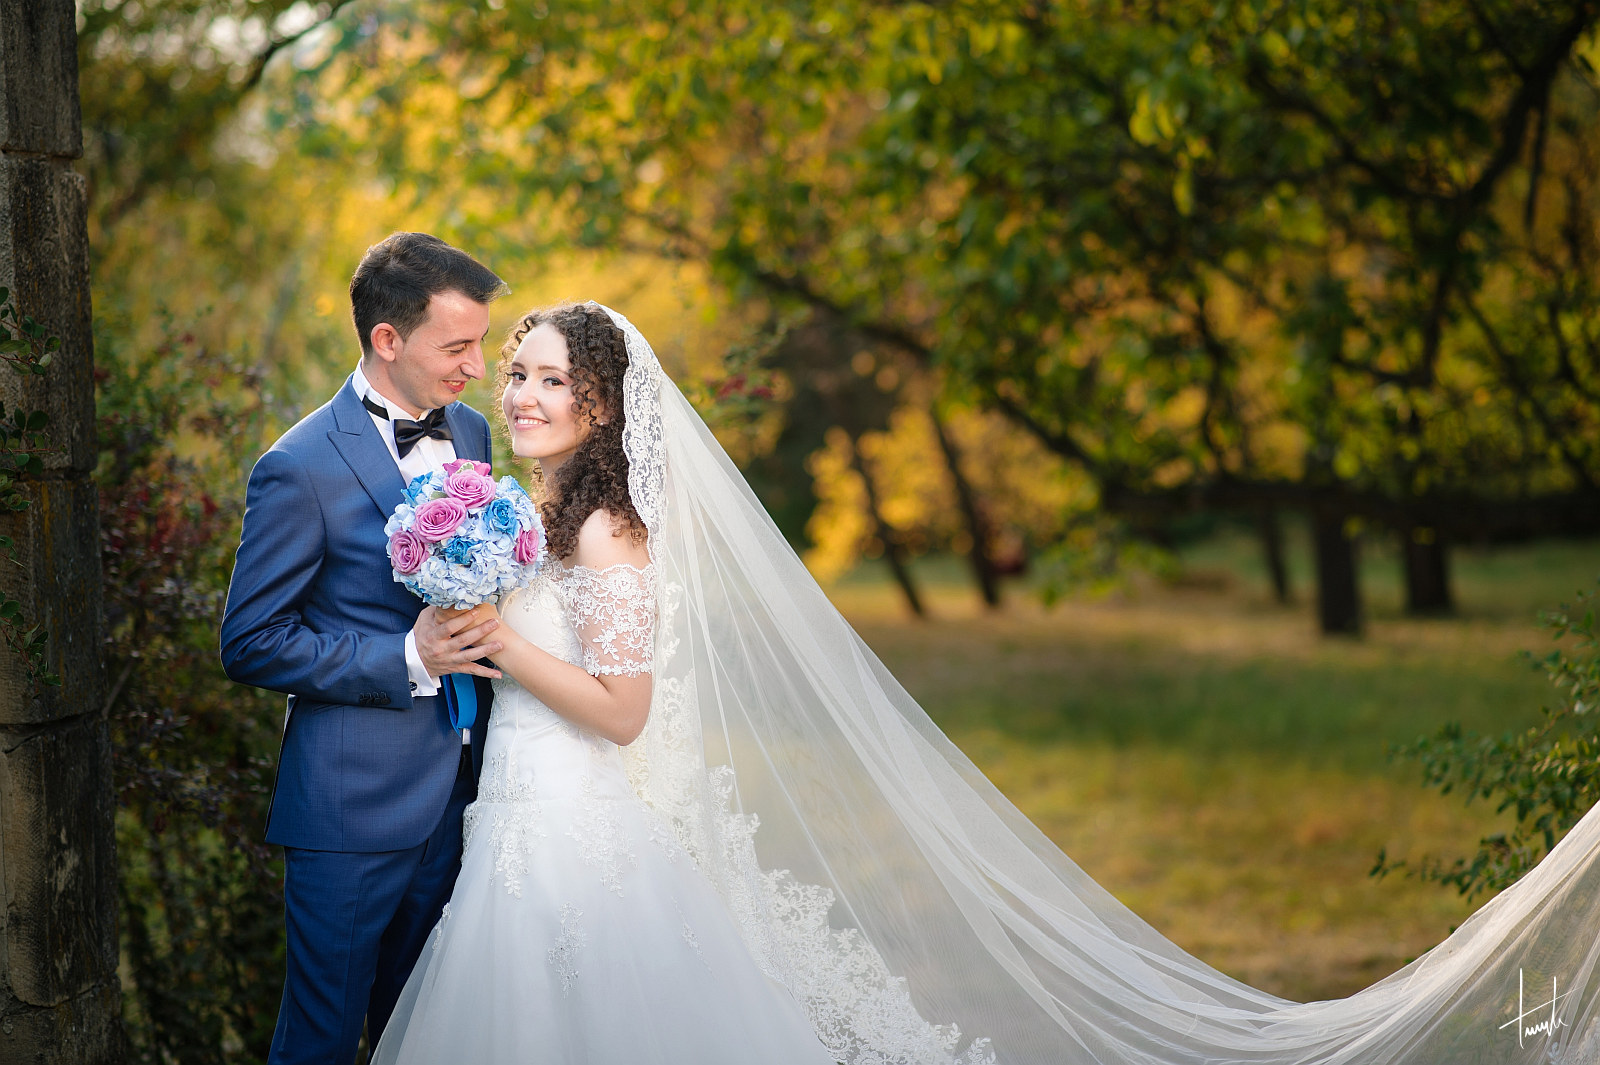 fotografie de nunta - Martha Ionut 07